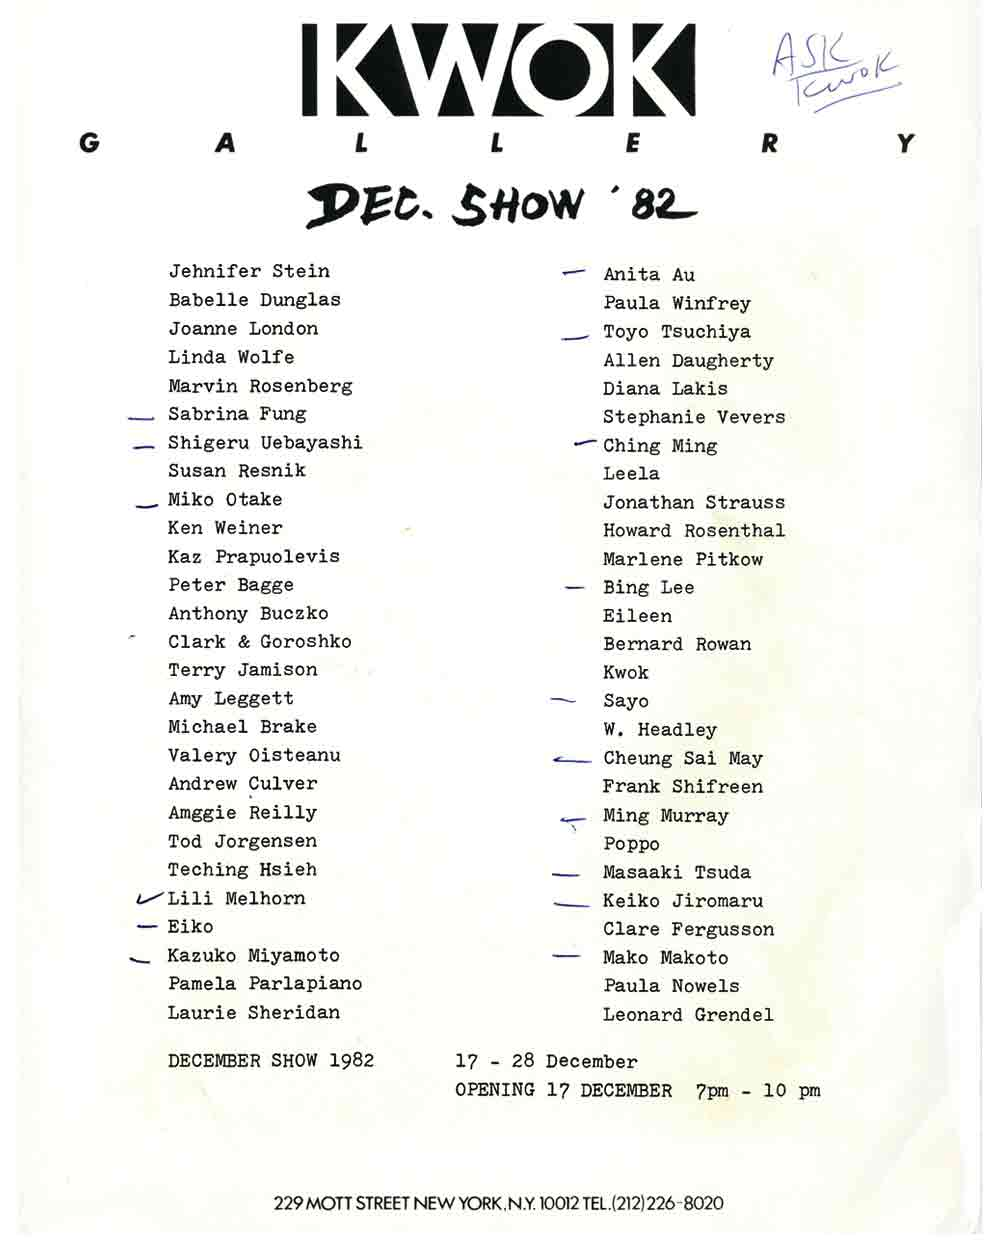 December Show press release, pg 3